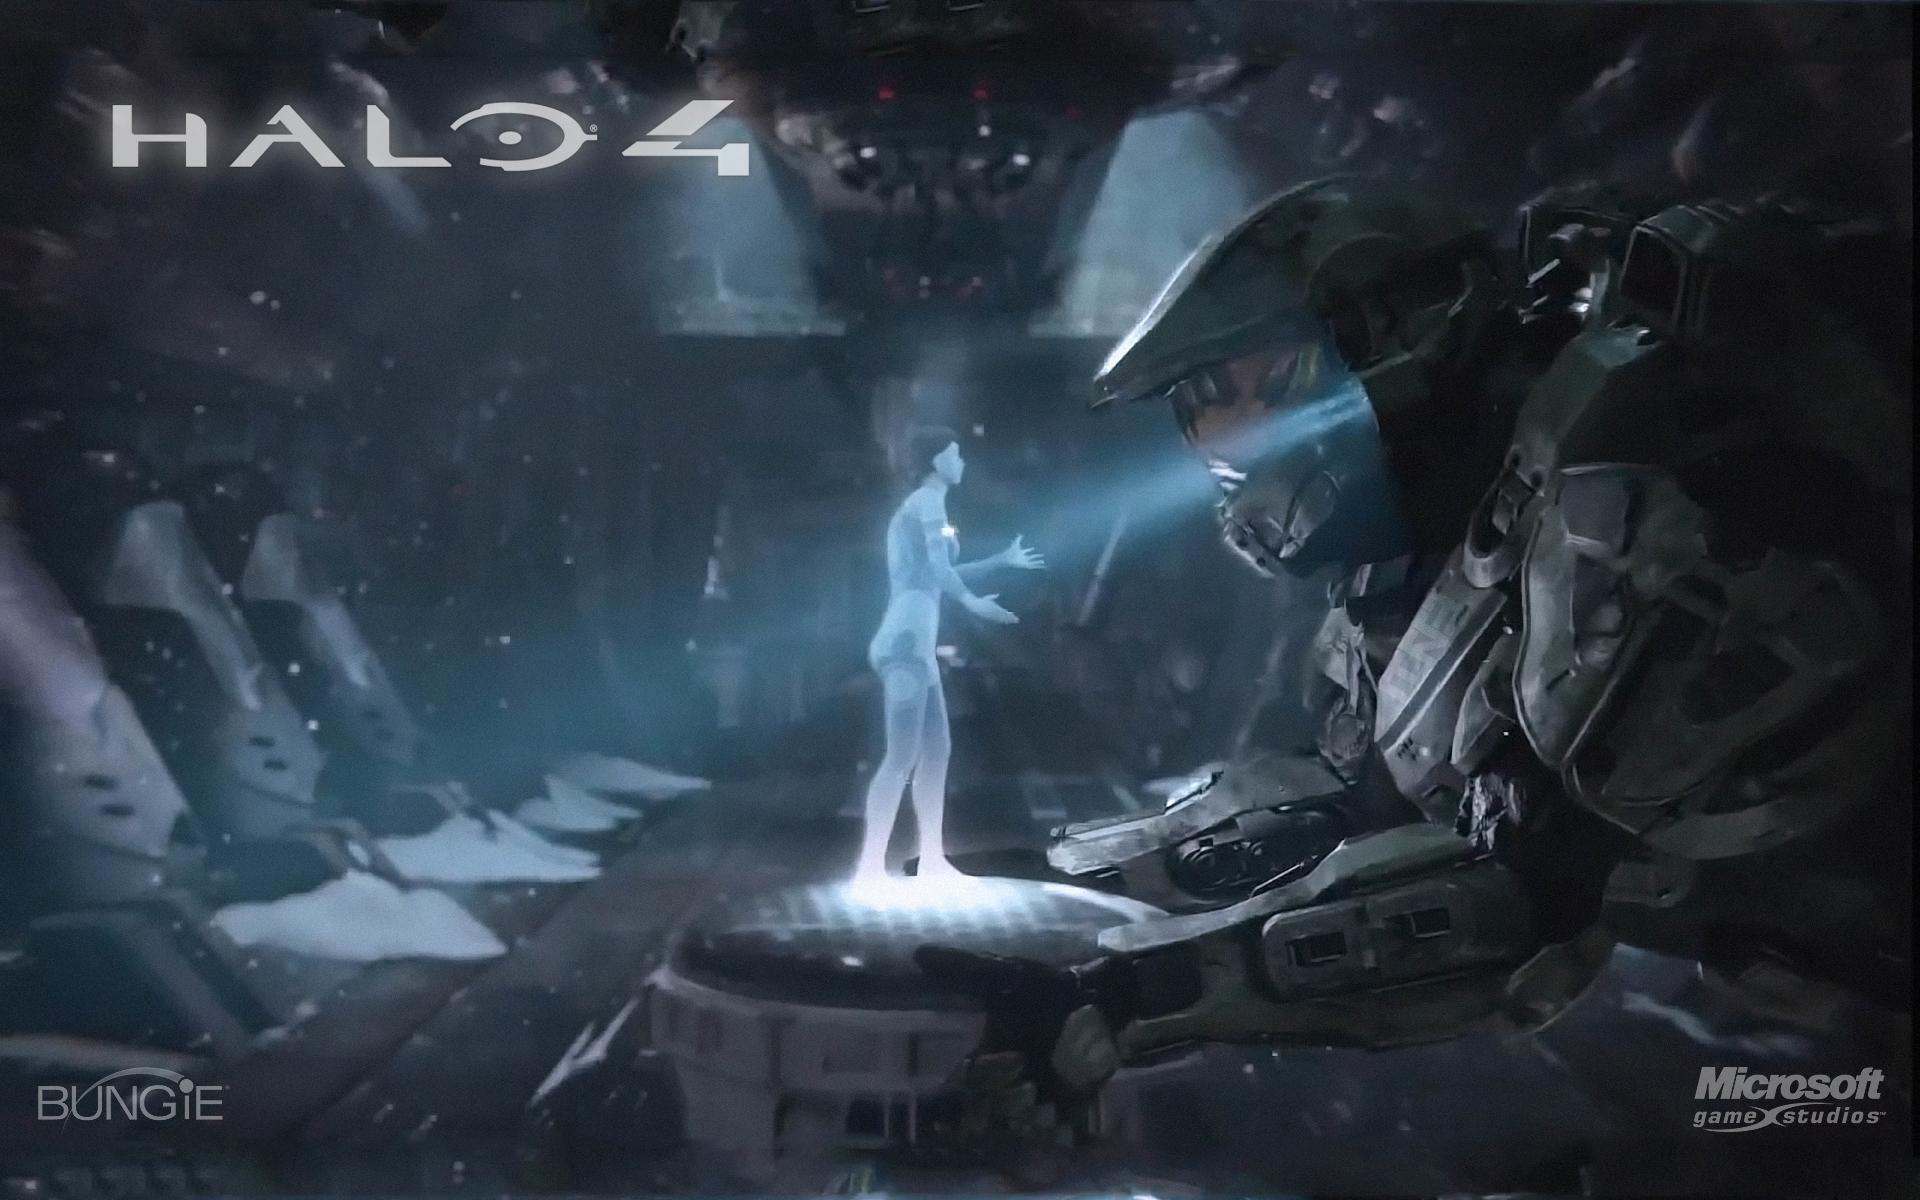 Halo 4 Hd Wallpapers Halo Wallpaper 1920x1200